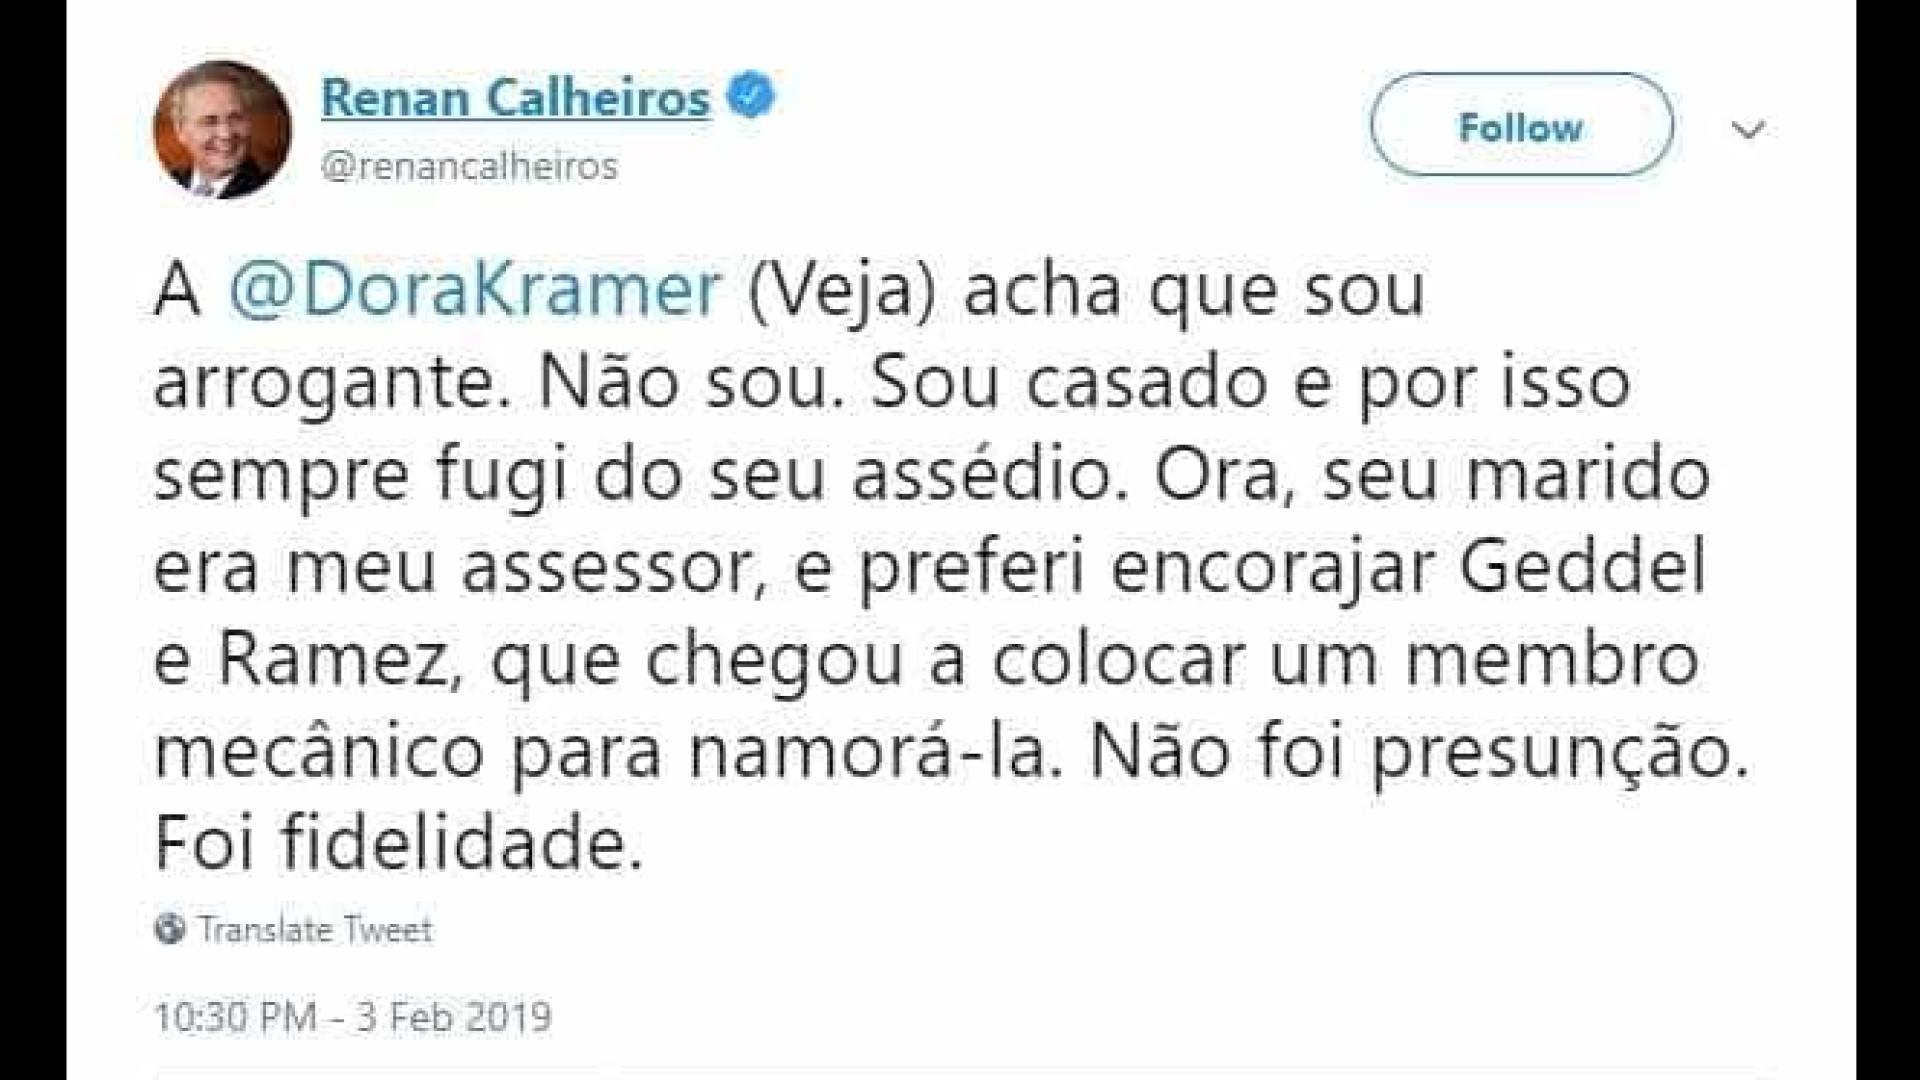 Renan acusa jornalista de assédio e expõe intimidades nas redes sociais